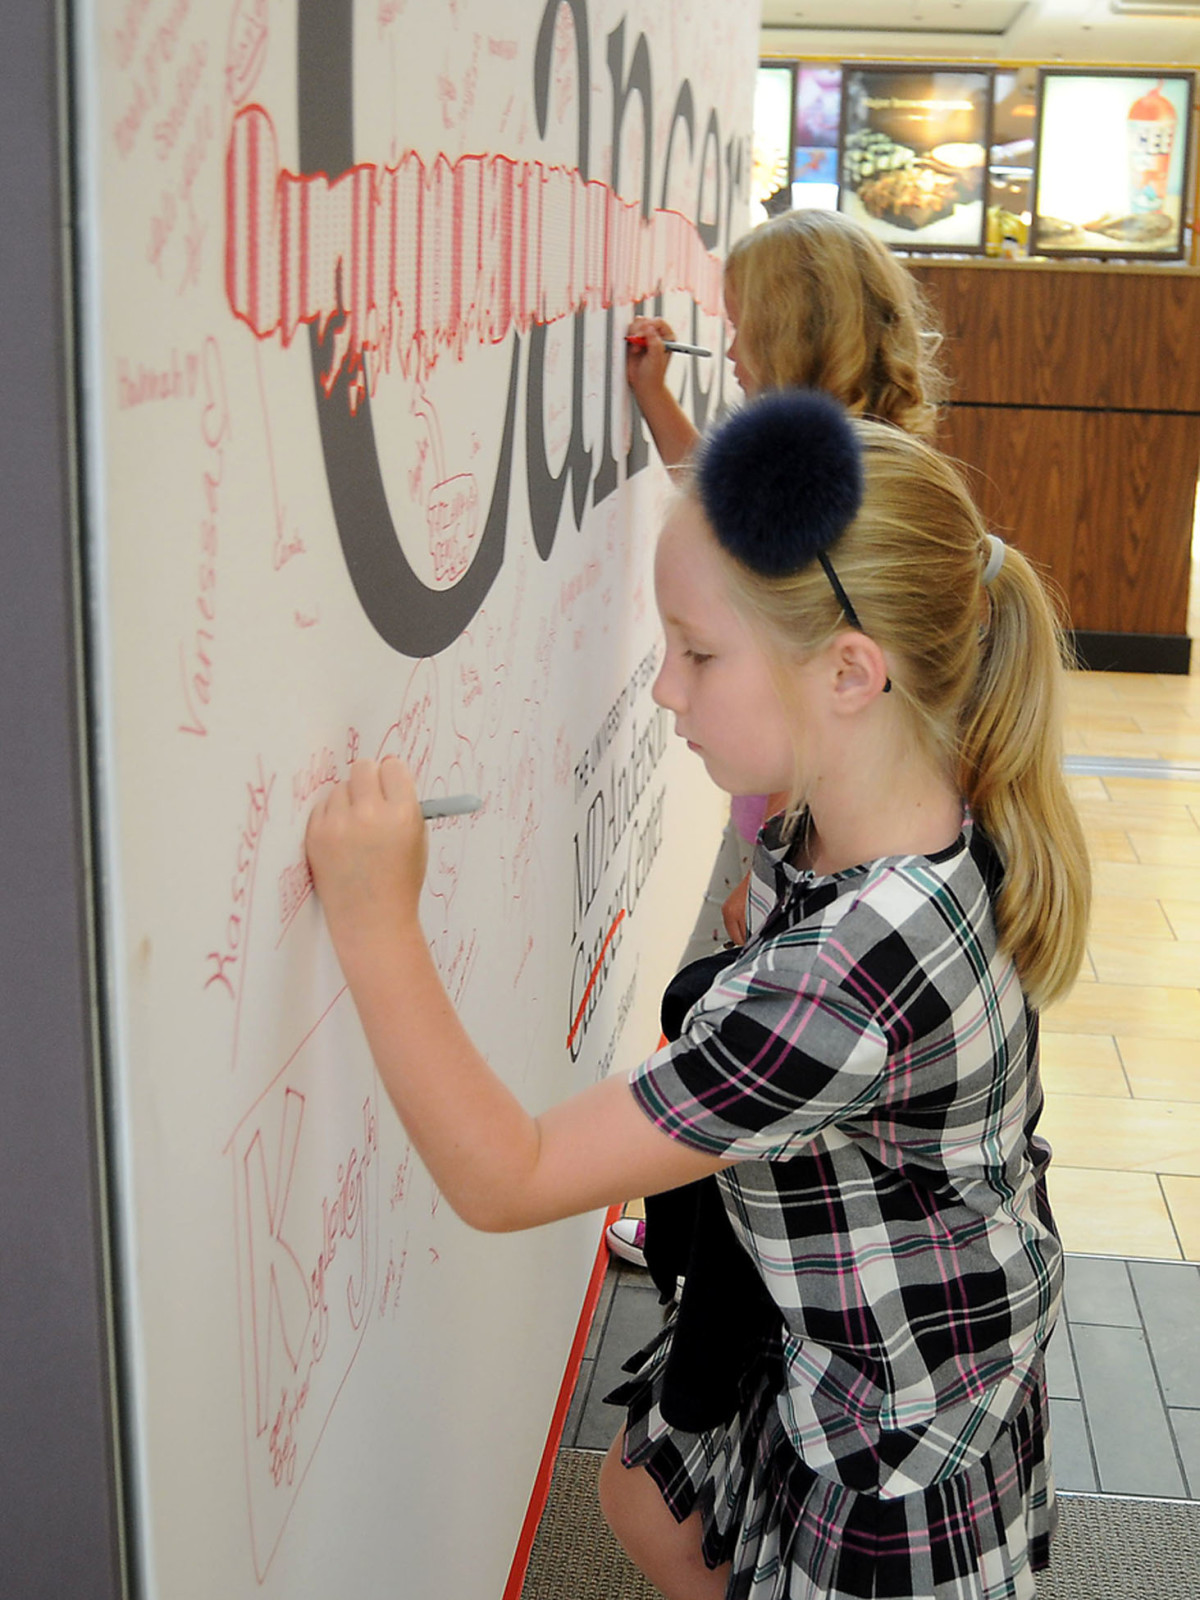 News, Shelby, MD Anderson Back to School, August 2015, Elizabeth Loeffler